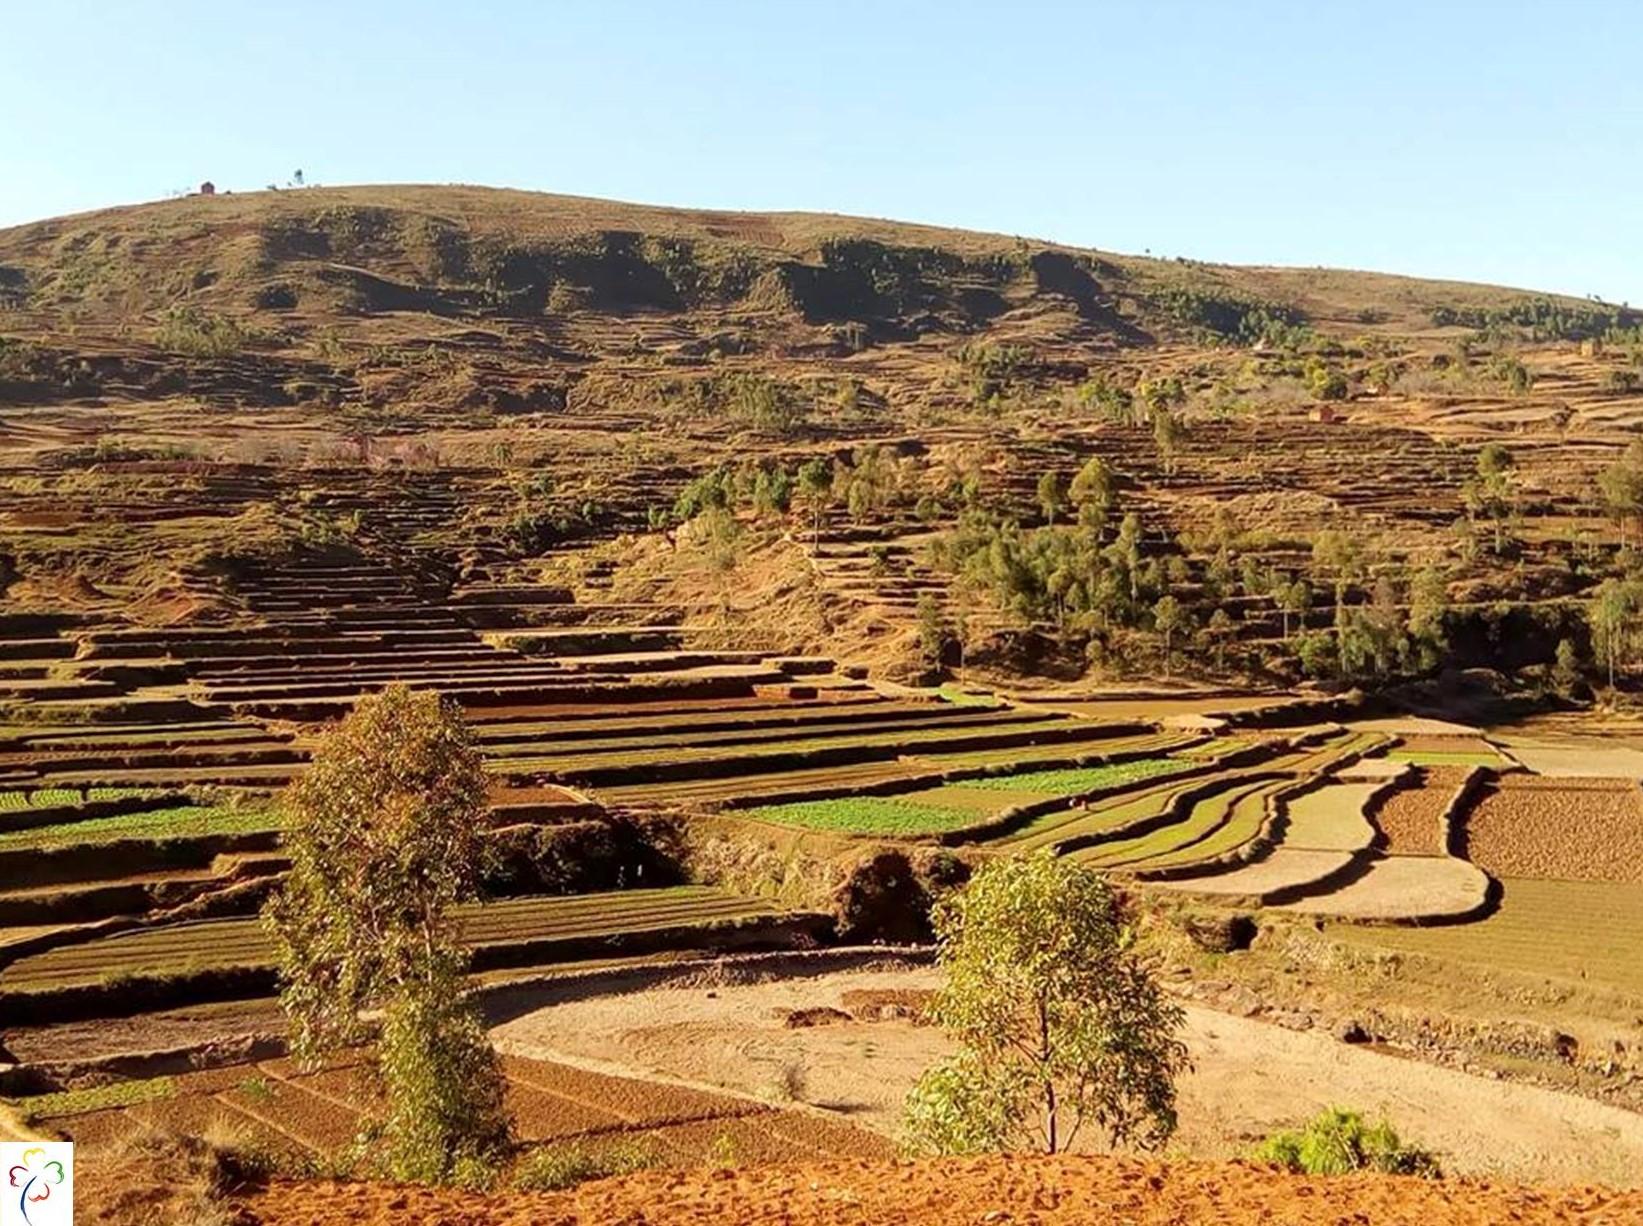 Paysages des hautes terres malgaches